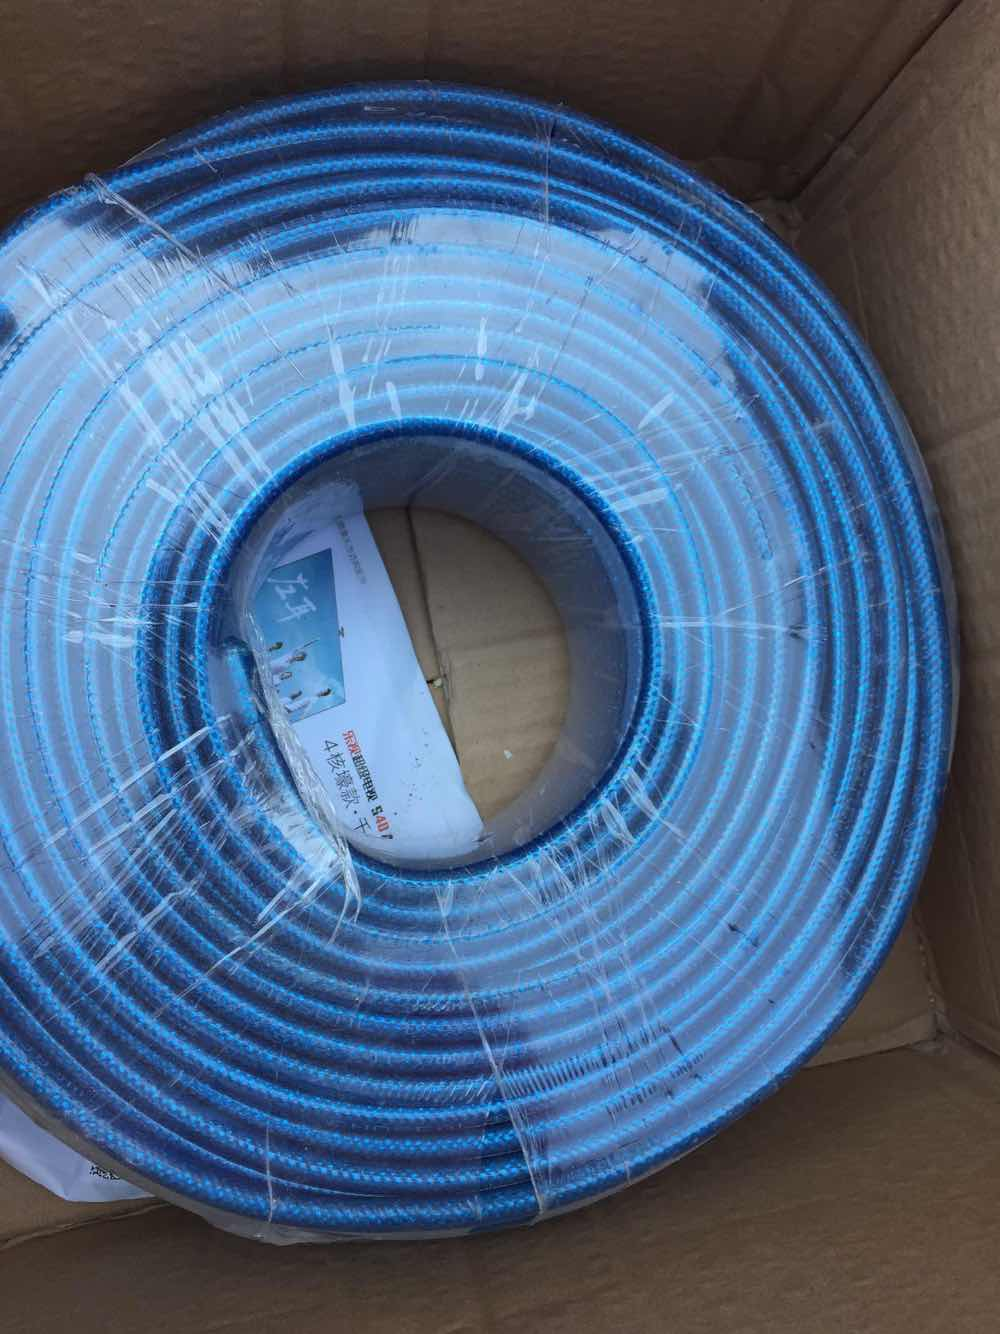 air jordans 2011 releases 00241994 bags